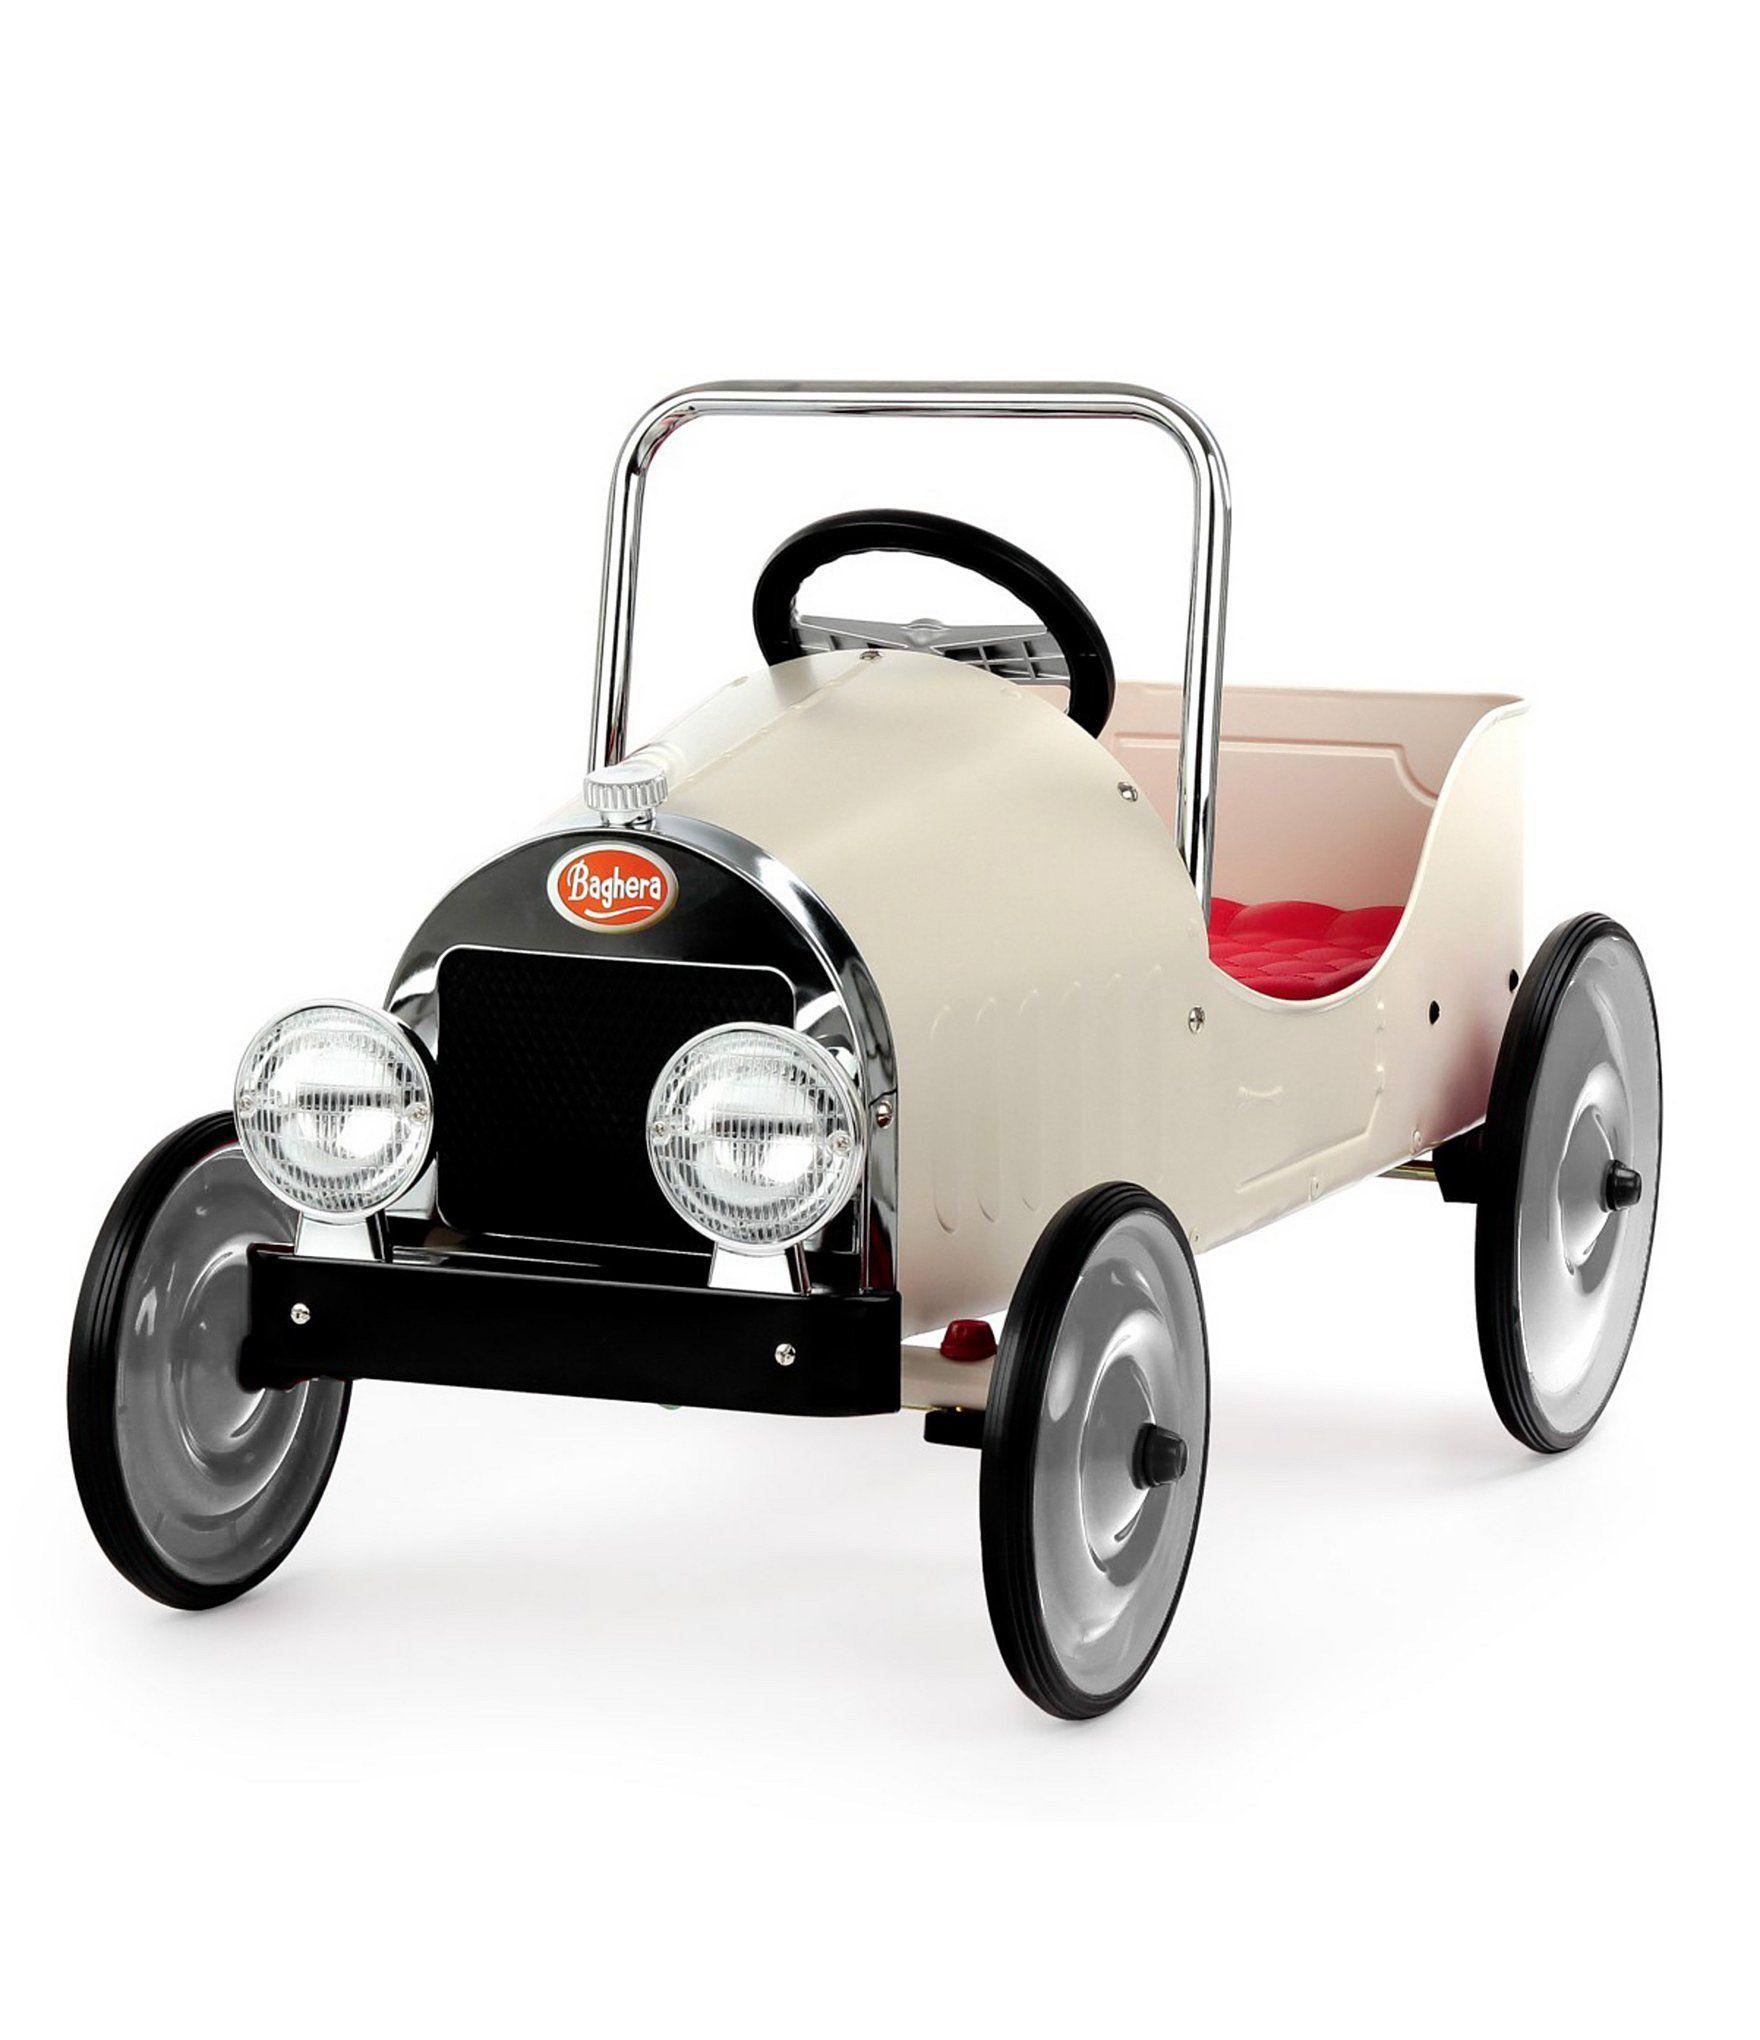 Baghera Classic Pedal Car | Dillard's